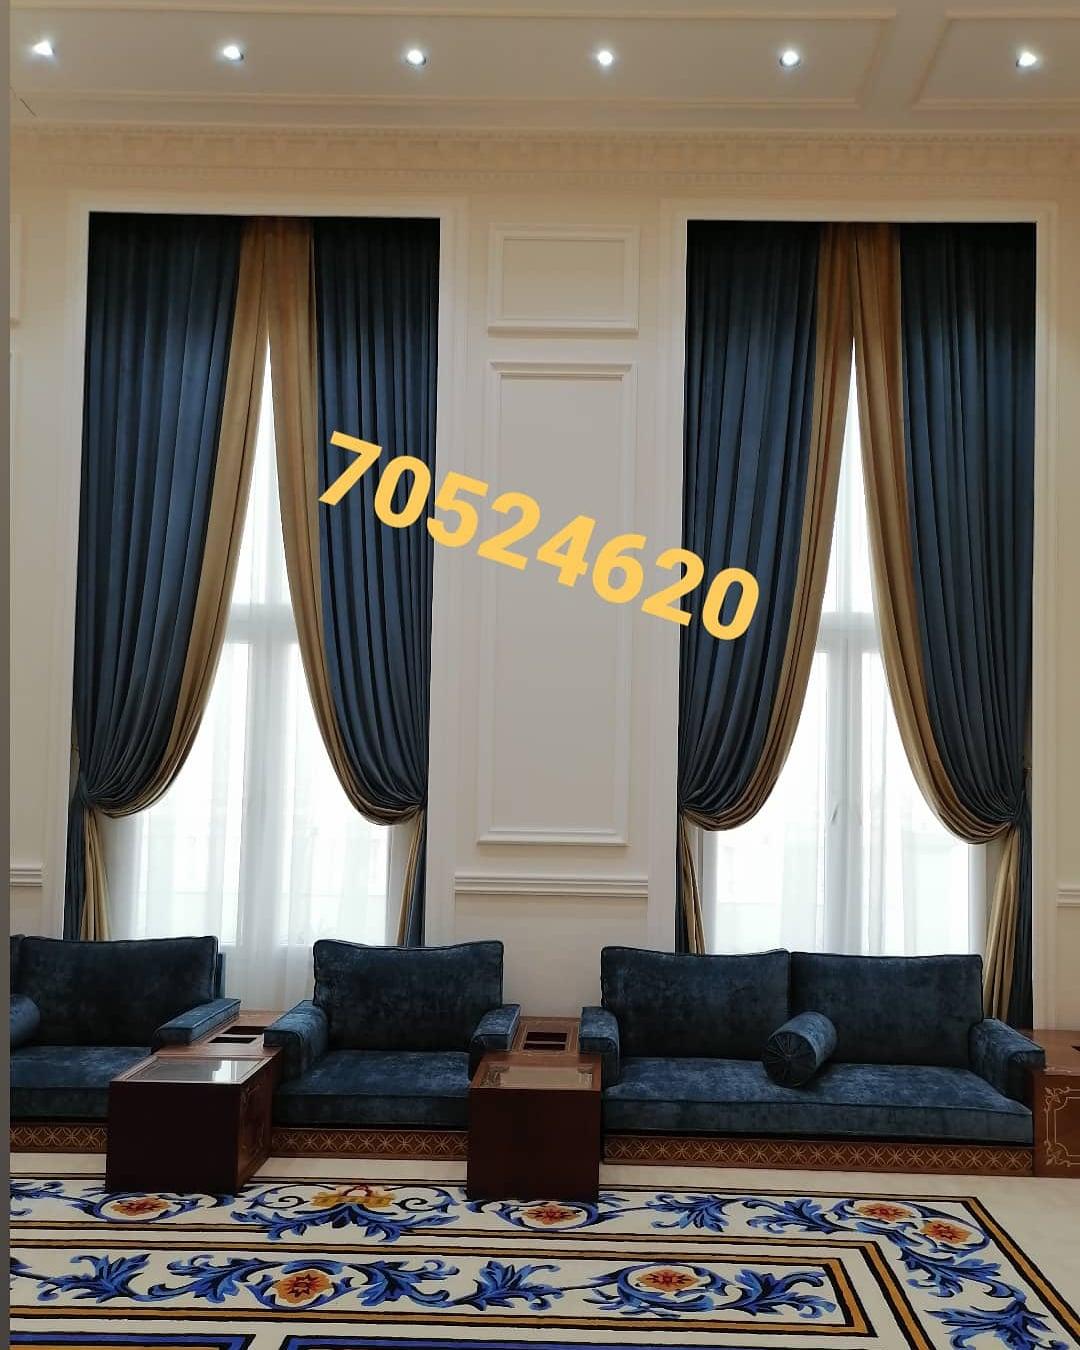 Curtains sealing